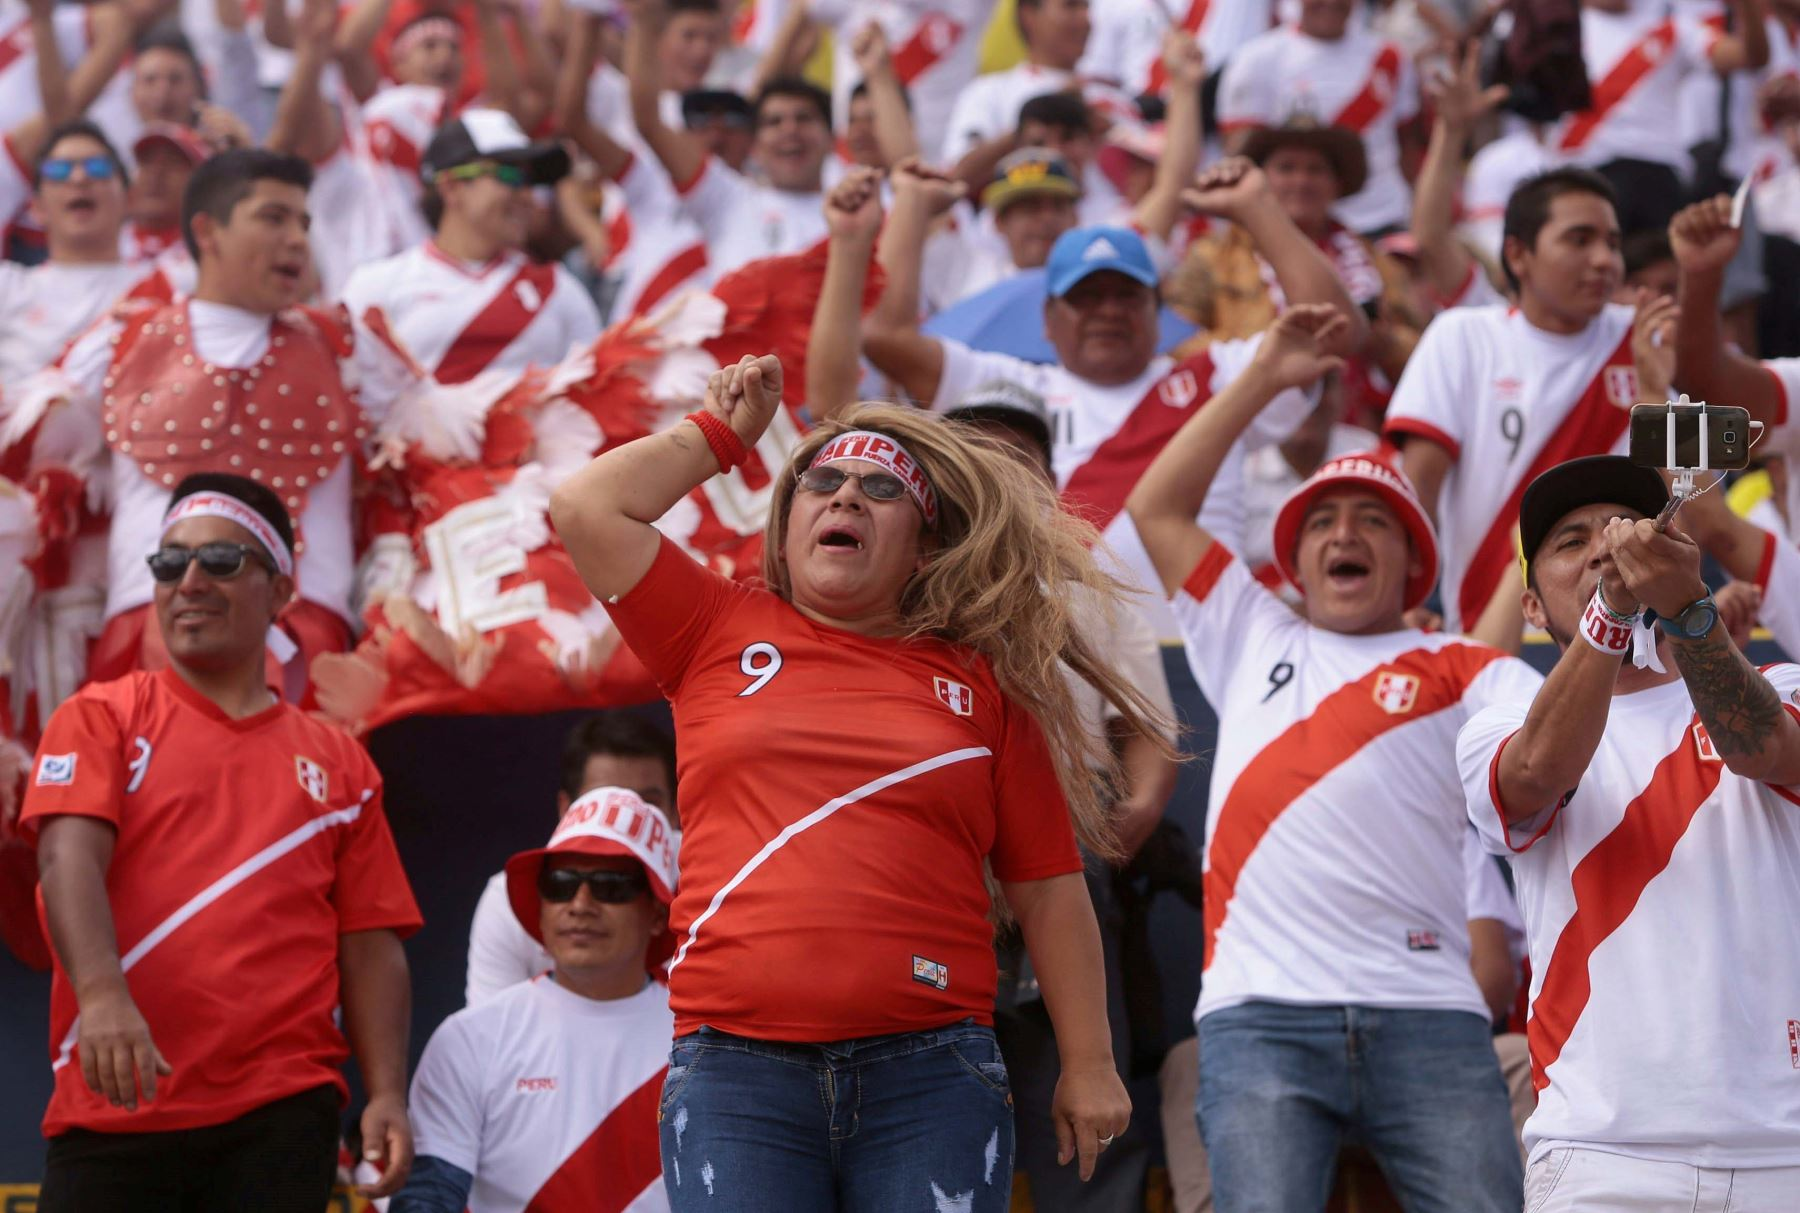 White peruvians